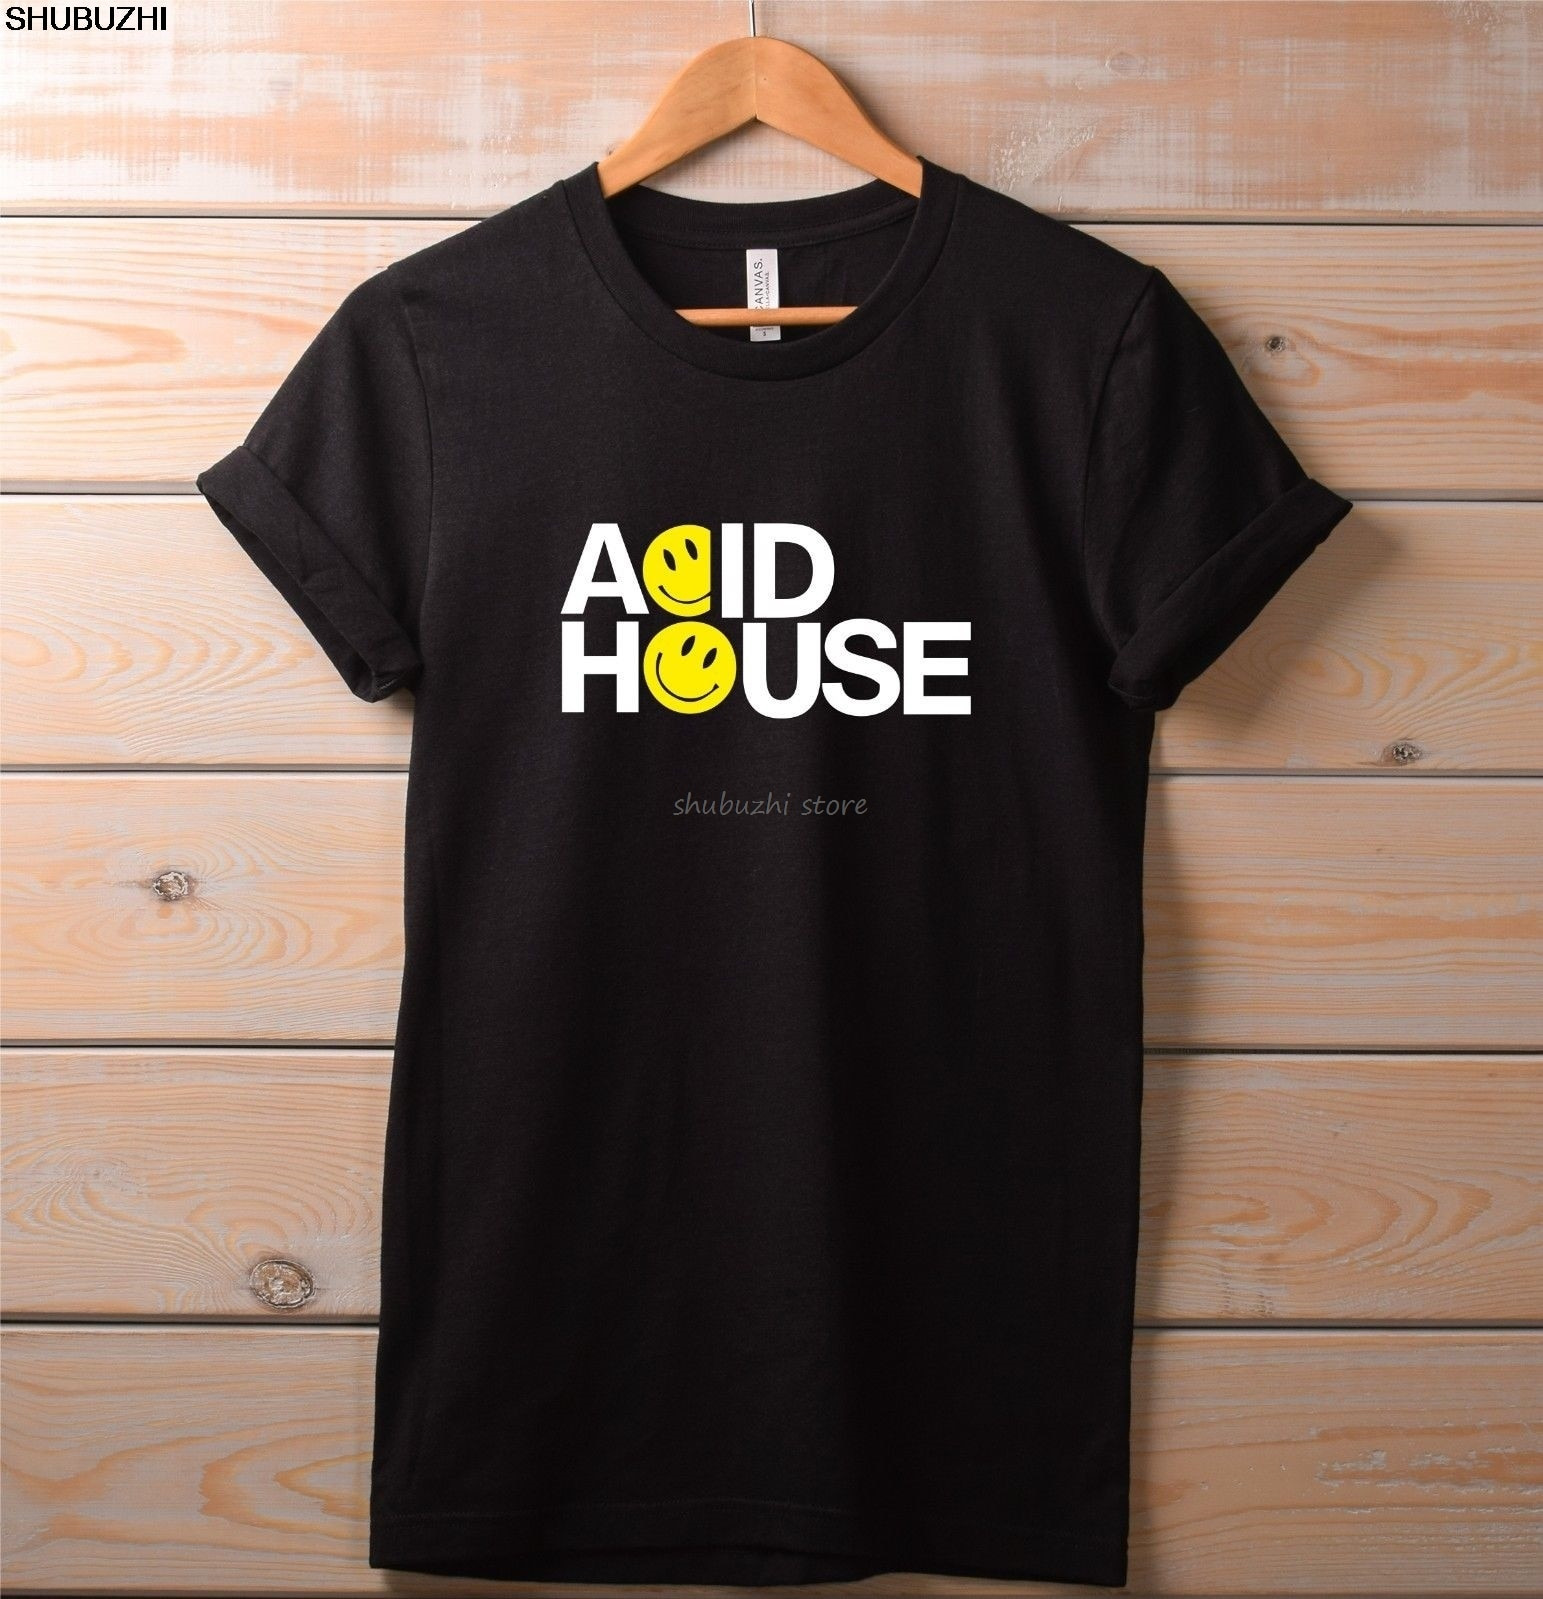 Camiseta Acid House. Música rave top Fiesta de verano festival drum n bass fantazia Casual orgullo t camisa de los hombres Unisex sbz1393